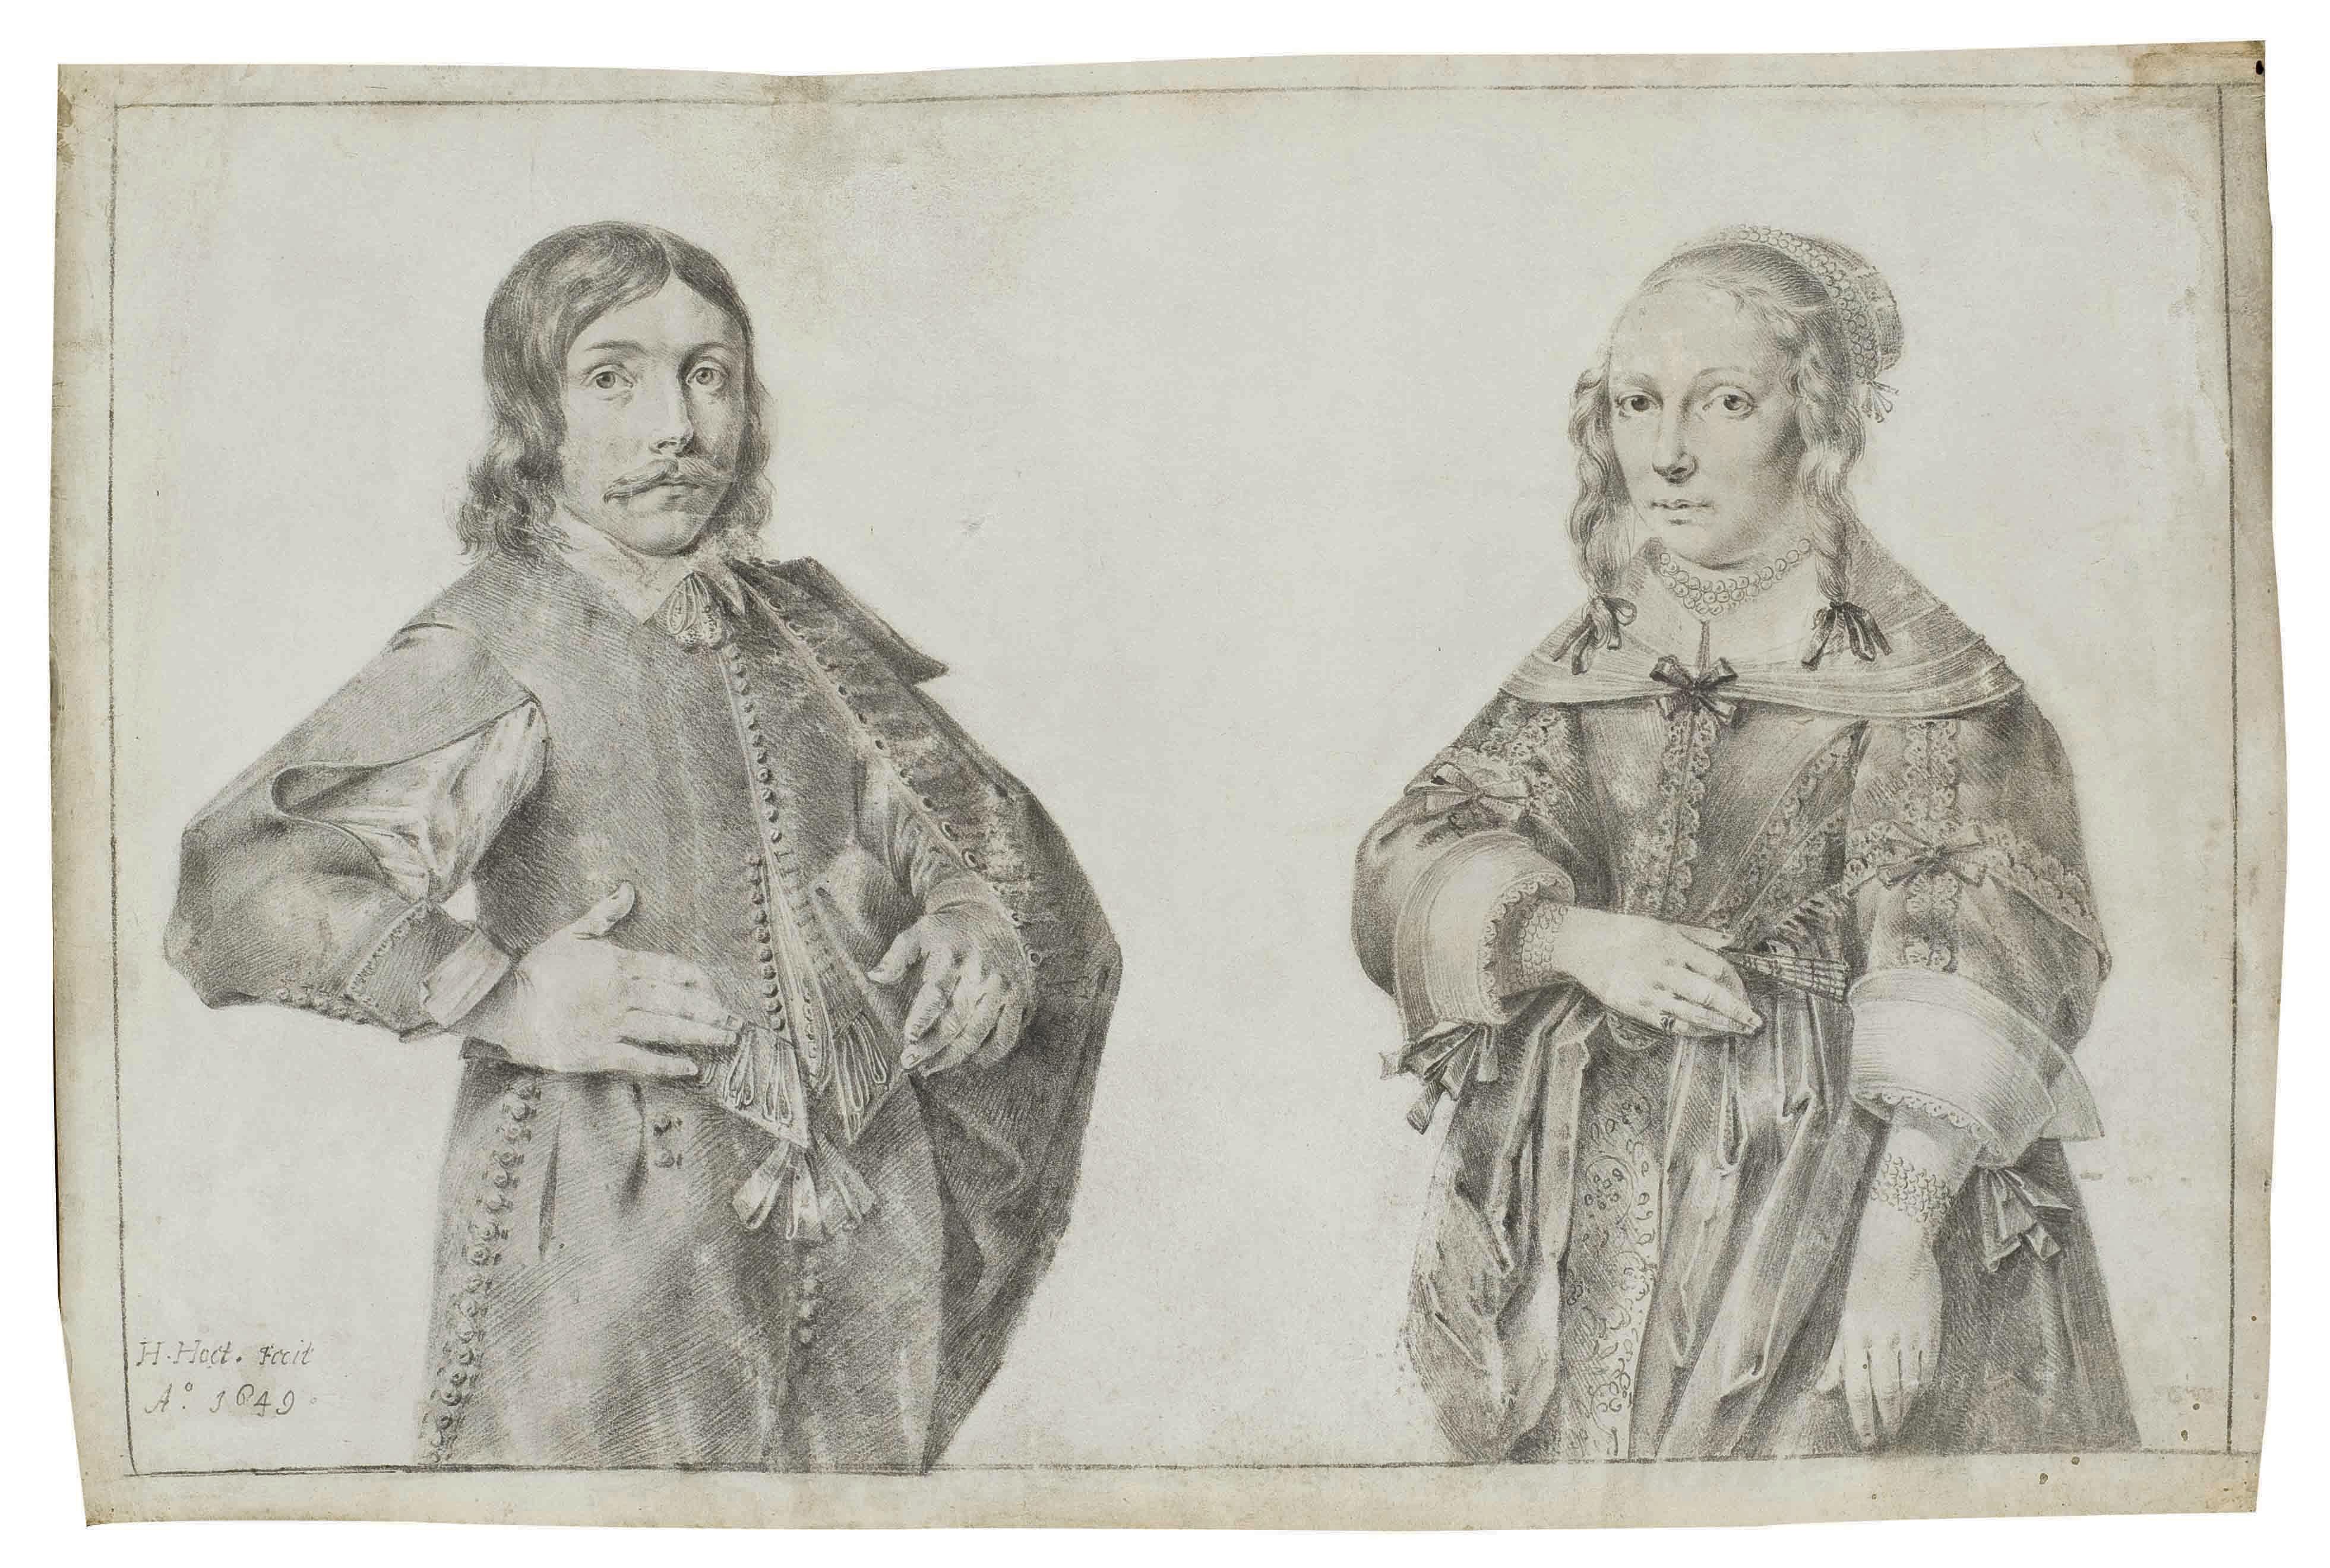 Portraits présumés des enfants de Roeland Govertsz van Haeften et Johanna Roch